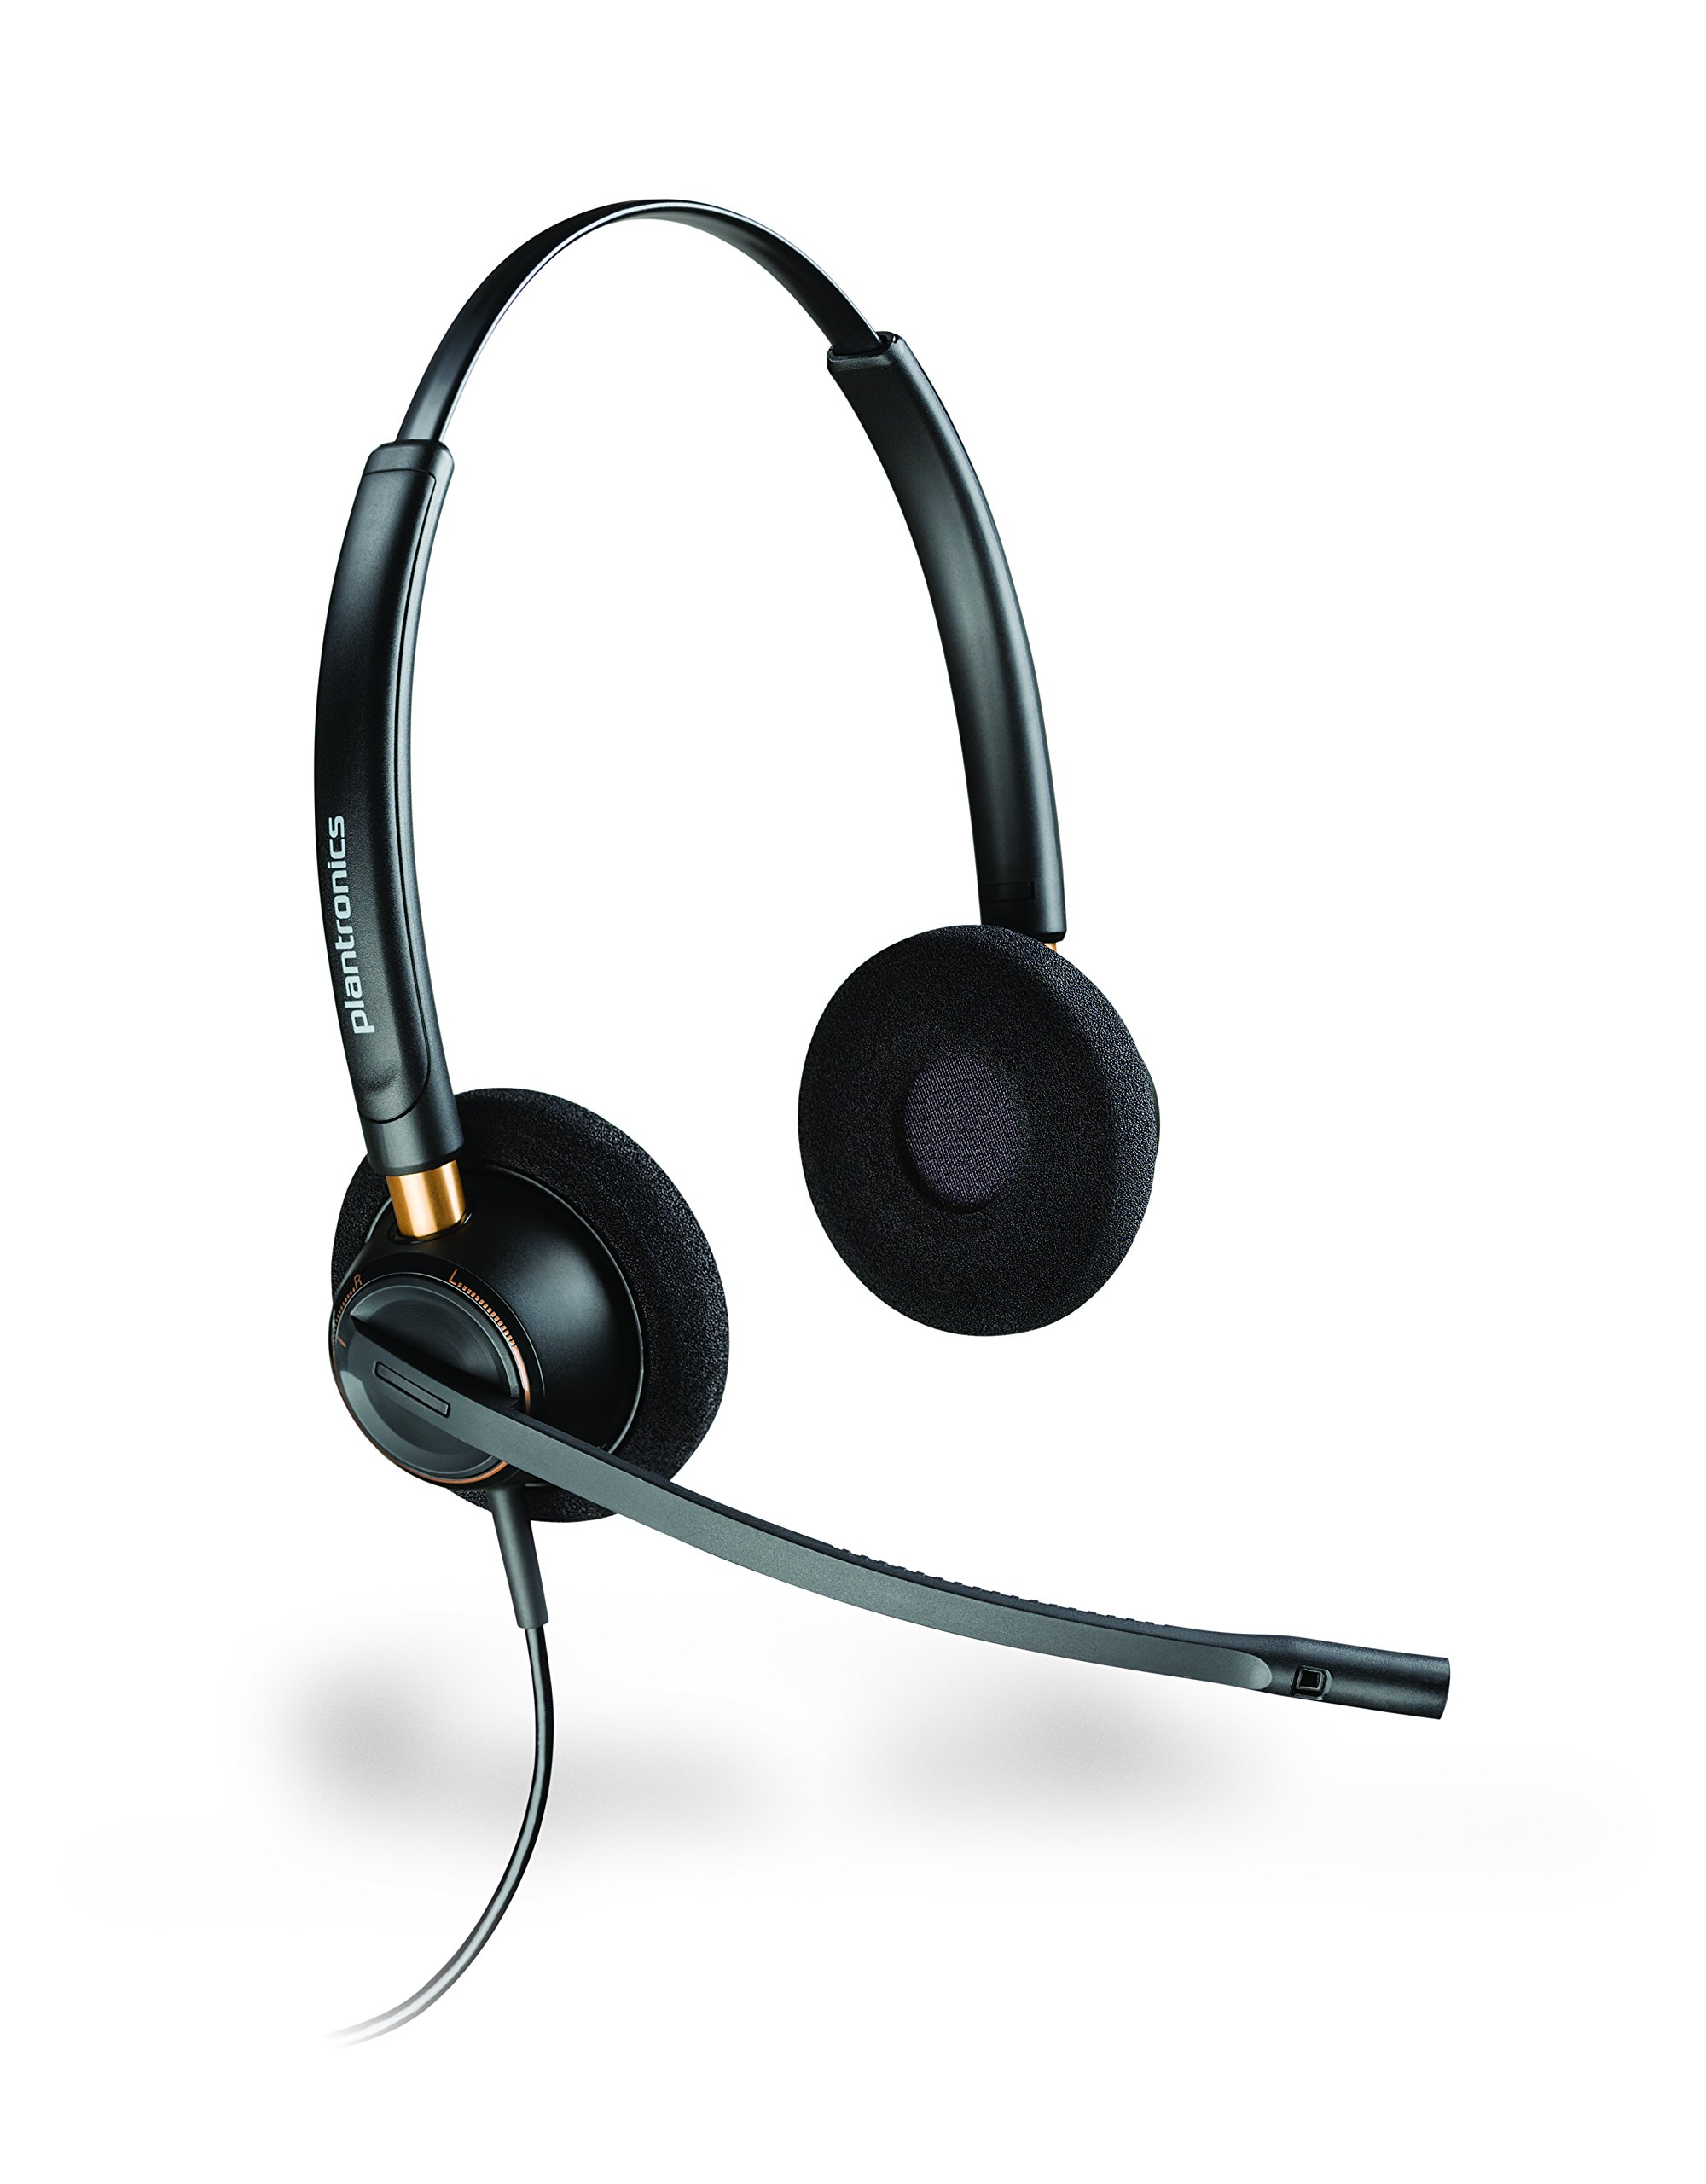 PLNHW520 - Plantronics EncorePro HW520 Headset